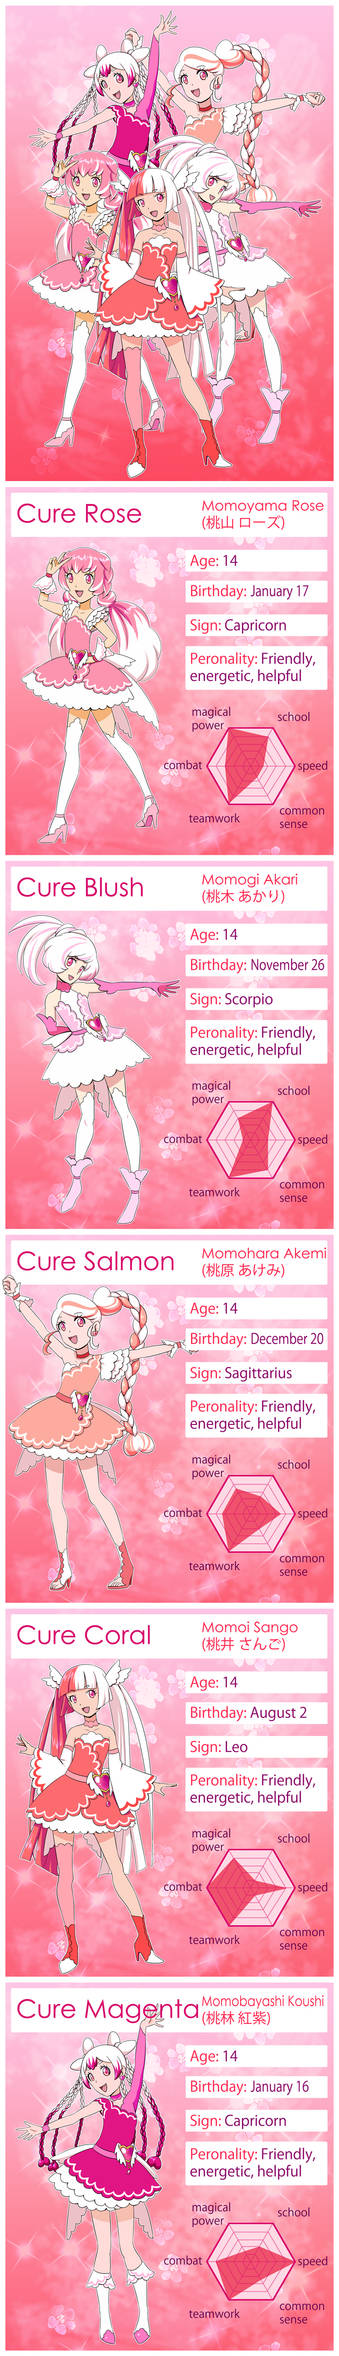 Dazzling Pink Precure!